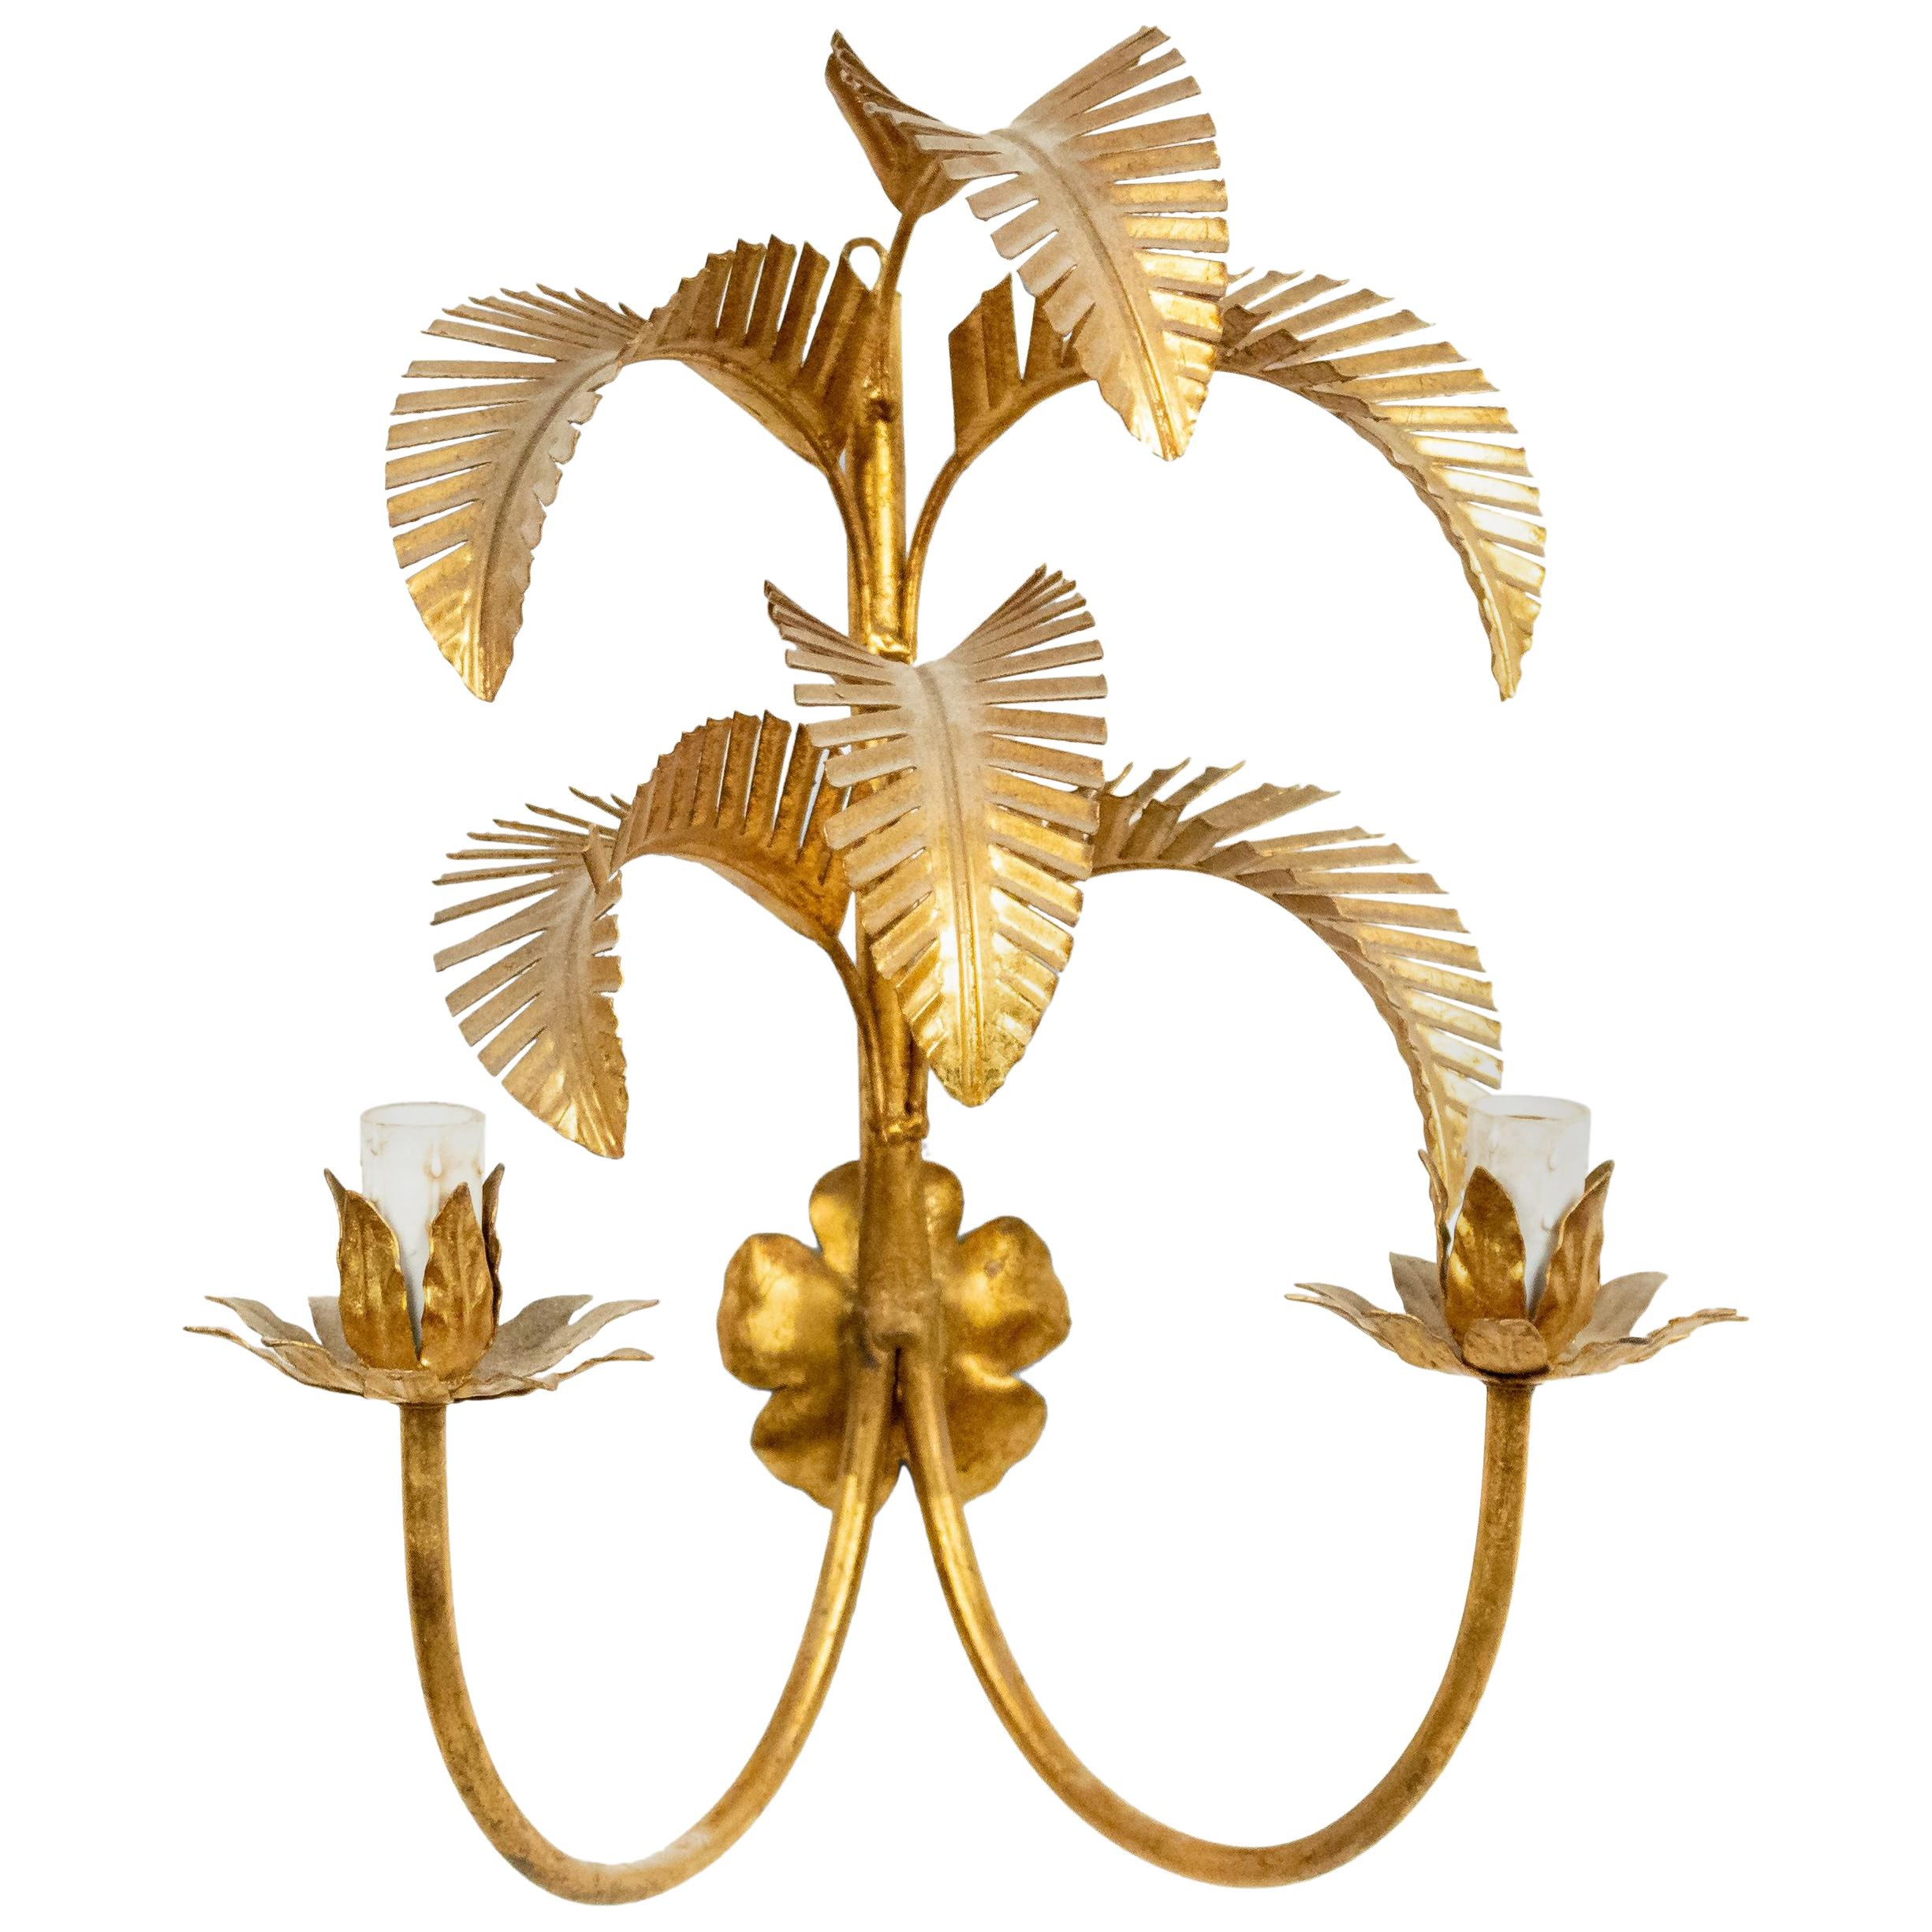 Italian Midcentury Gilt Palm Wall Sconce